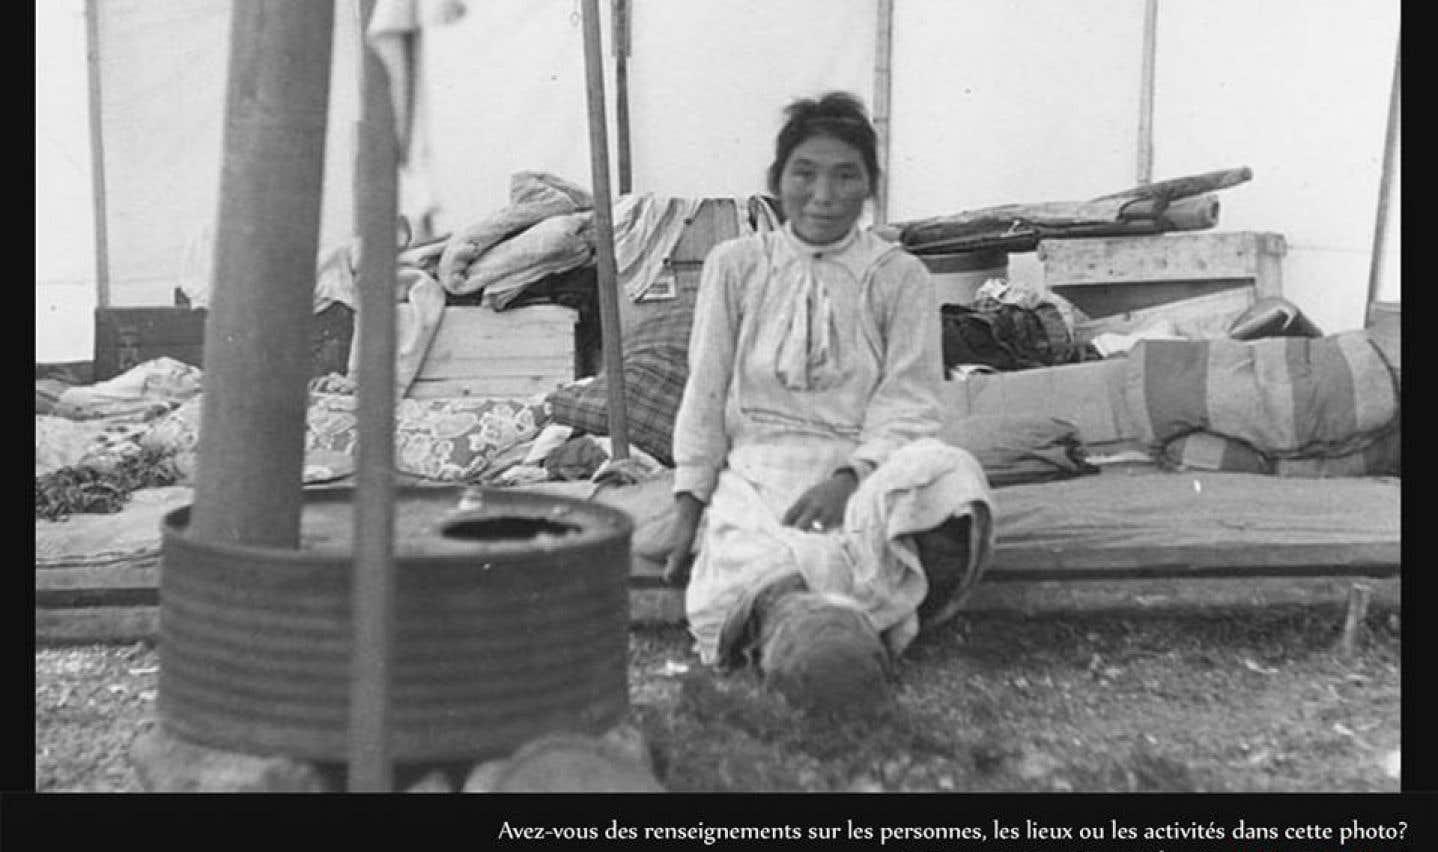 Femme inuite, Kangiqsujuaq (anciennement Wakeham Bay, Québec), 1948.